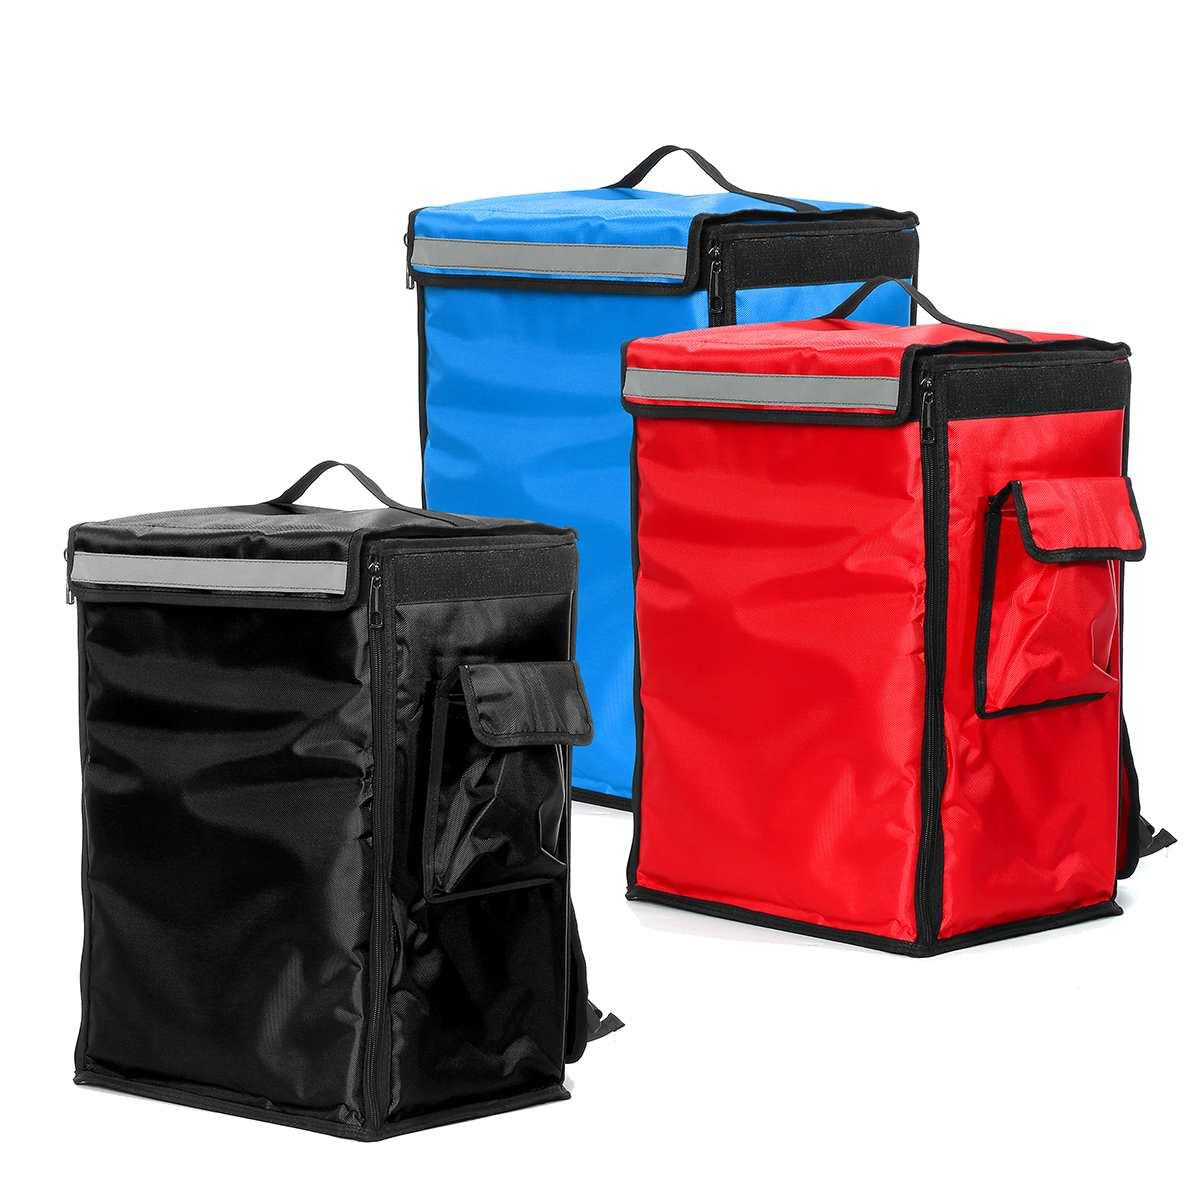 Saco de entrega de alimentos de pizza 42l portátil saco isolado térmico takeaway entrega mochila dobrável pacote de isolamento sacos de refrigerador de piquenique